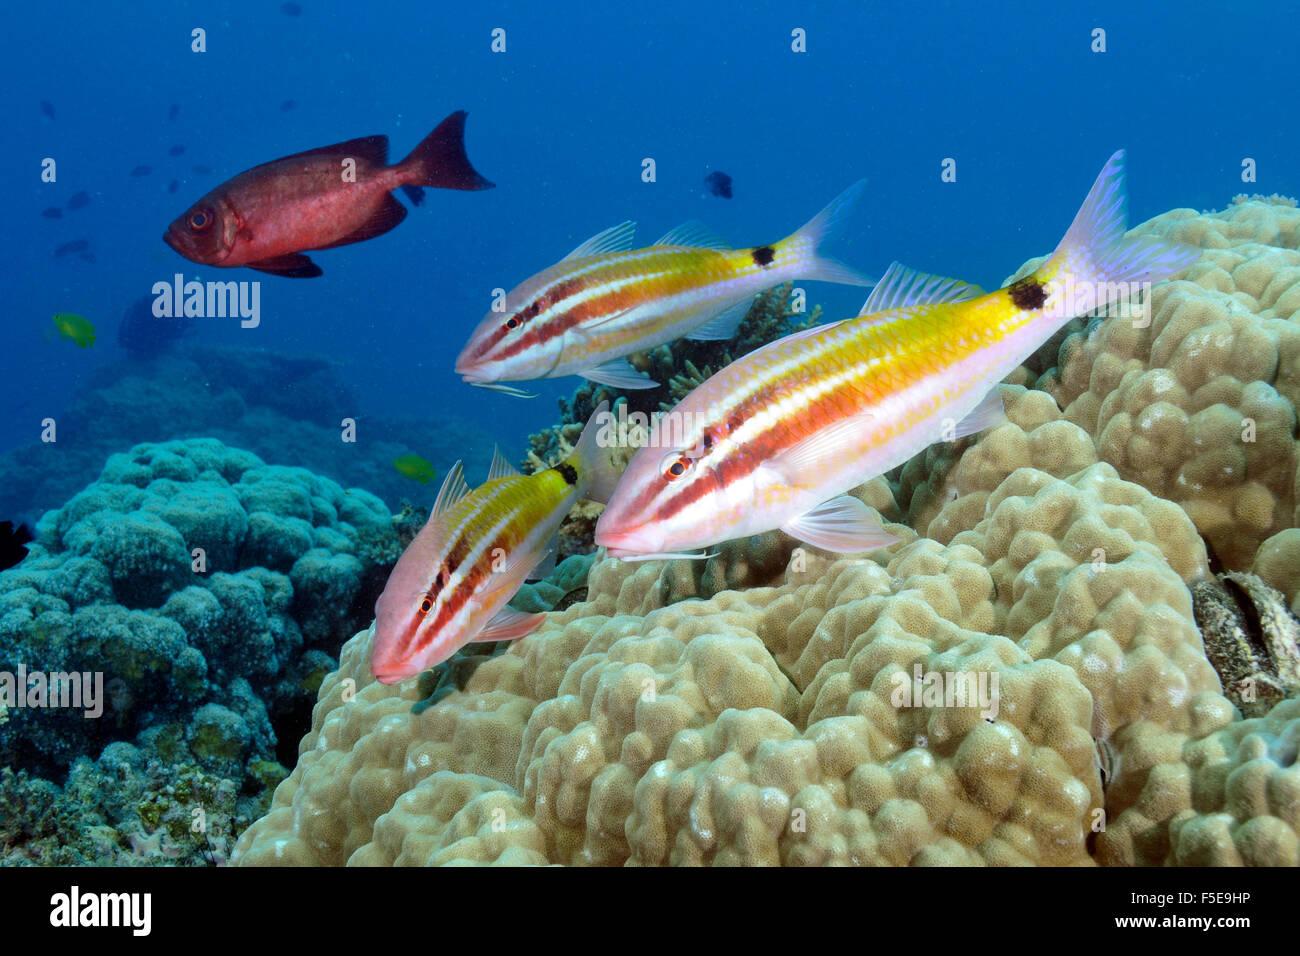 Blacksaddle goatfish, Parupeneus spilurus, in a coral reef, Seche Croissant, Noumea, New Caledonia - Stock Image